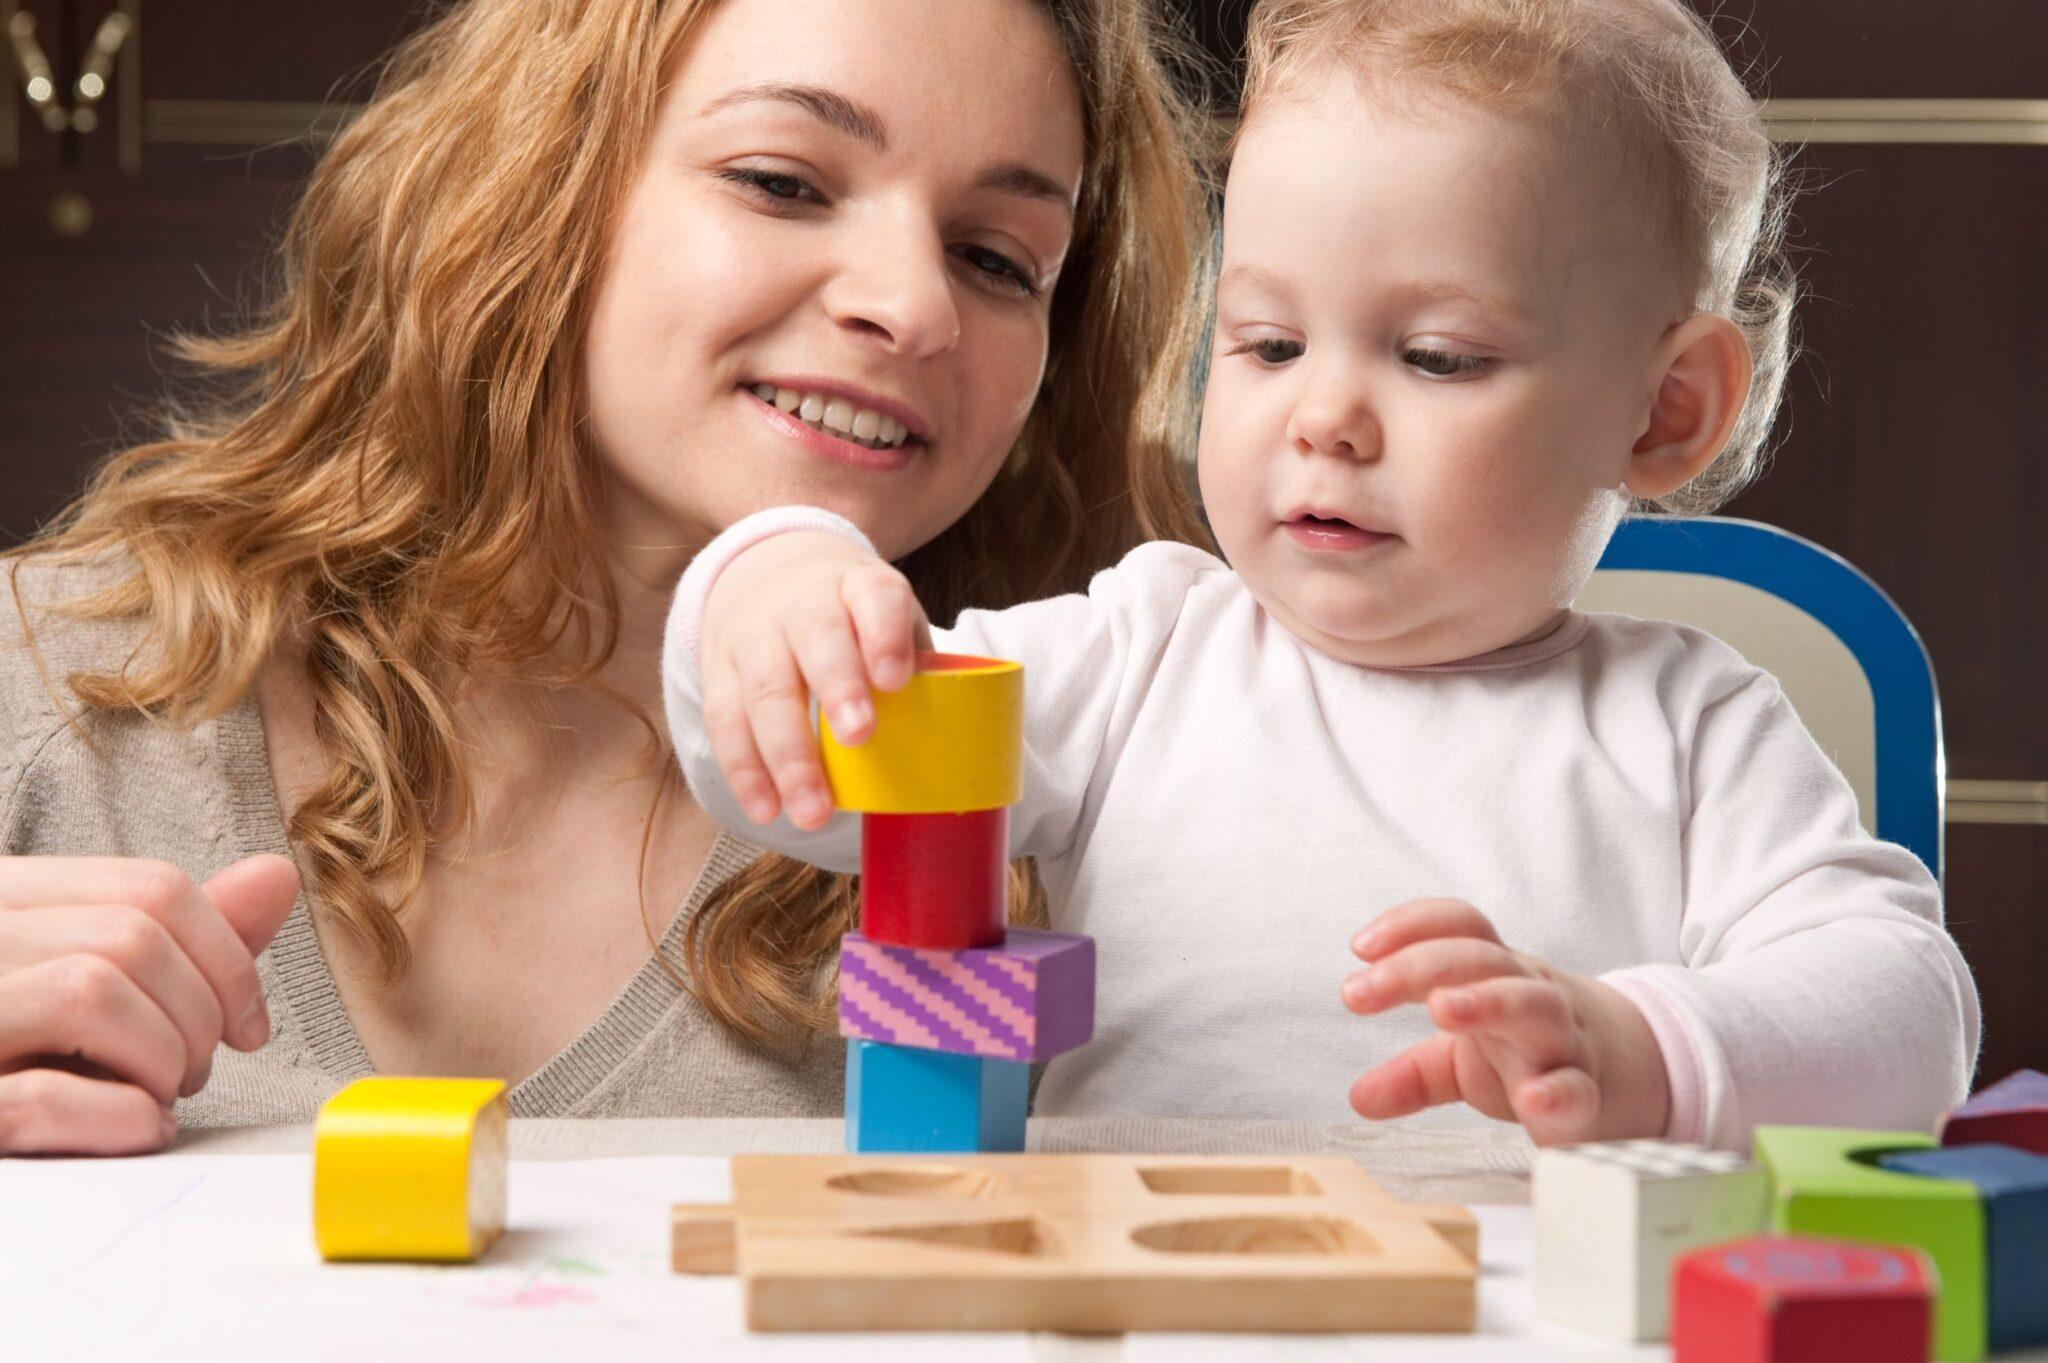 Baby building bricks with Nanny